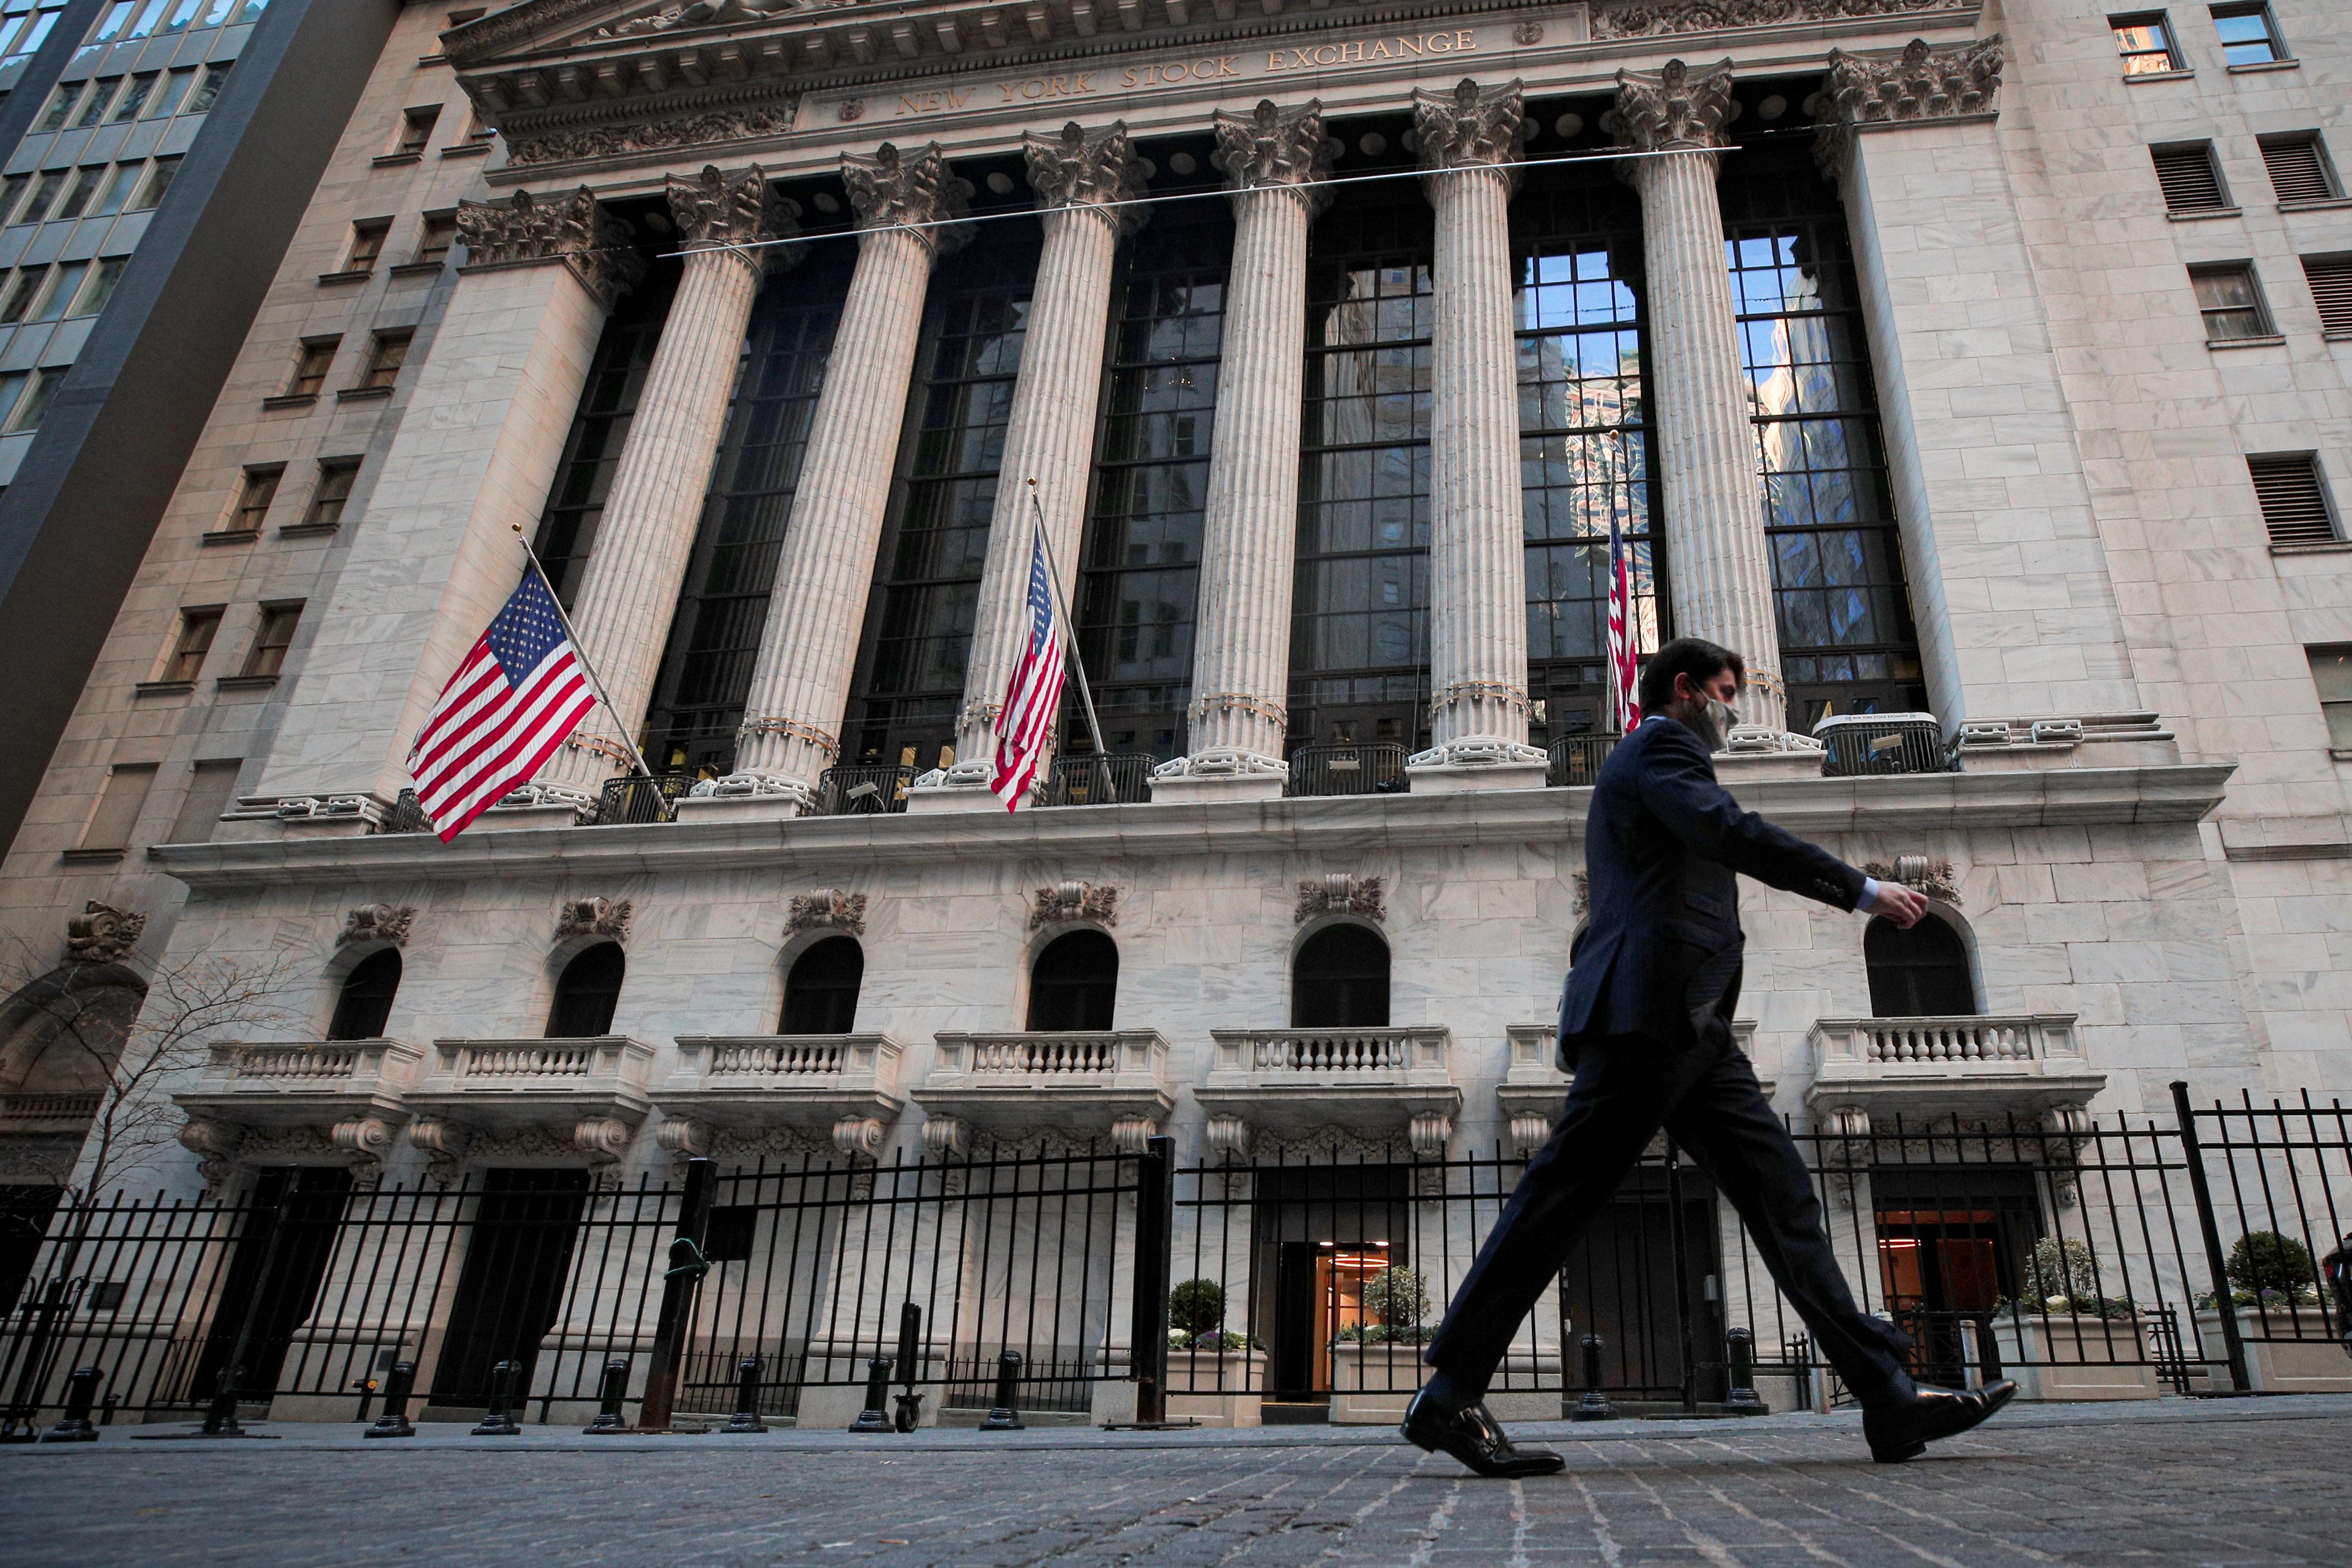 A man walks outside the New York Stock Exchange (NYSE) in New York, U.S., November 24, 2020. REUTERS/Brendan McDermid